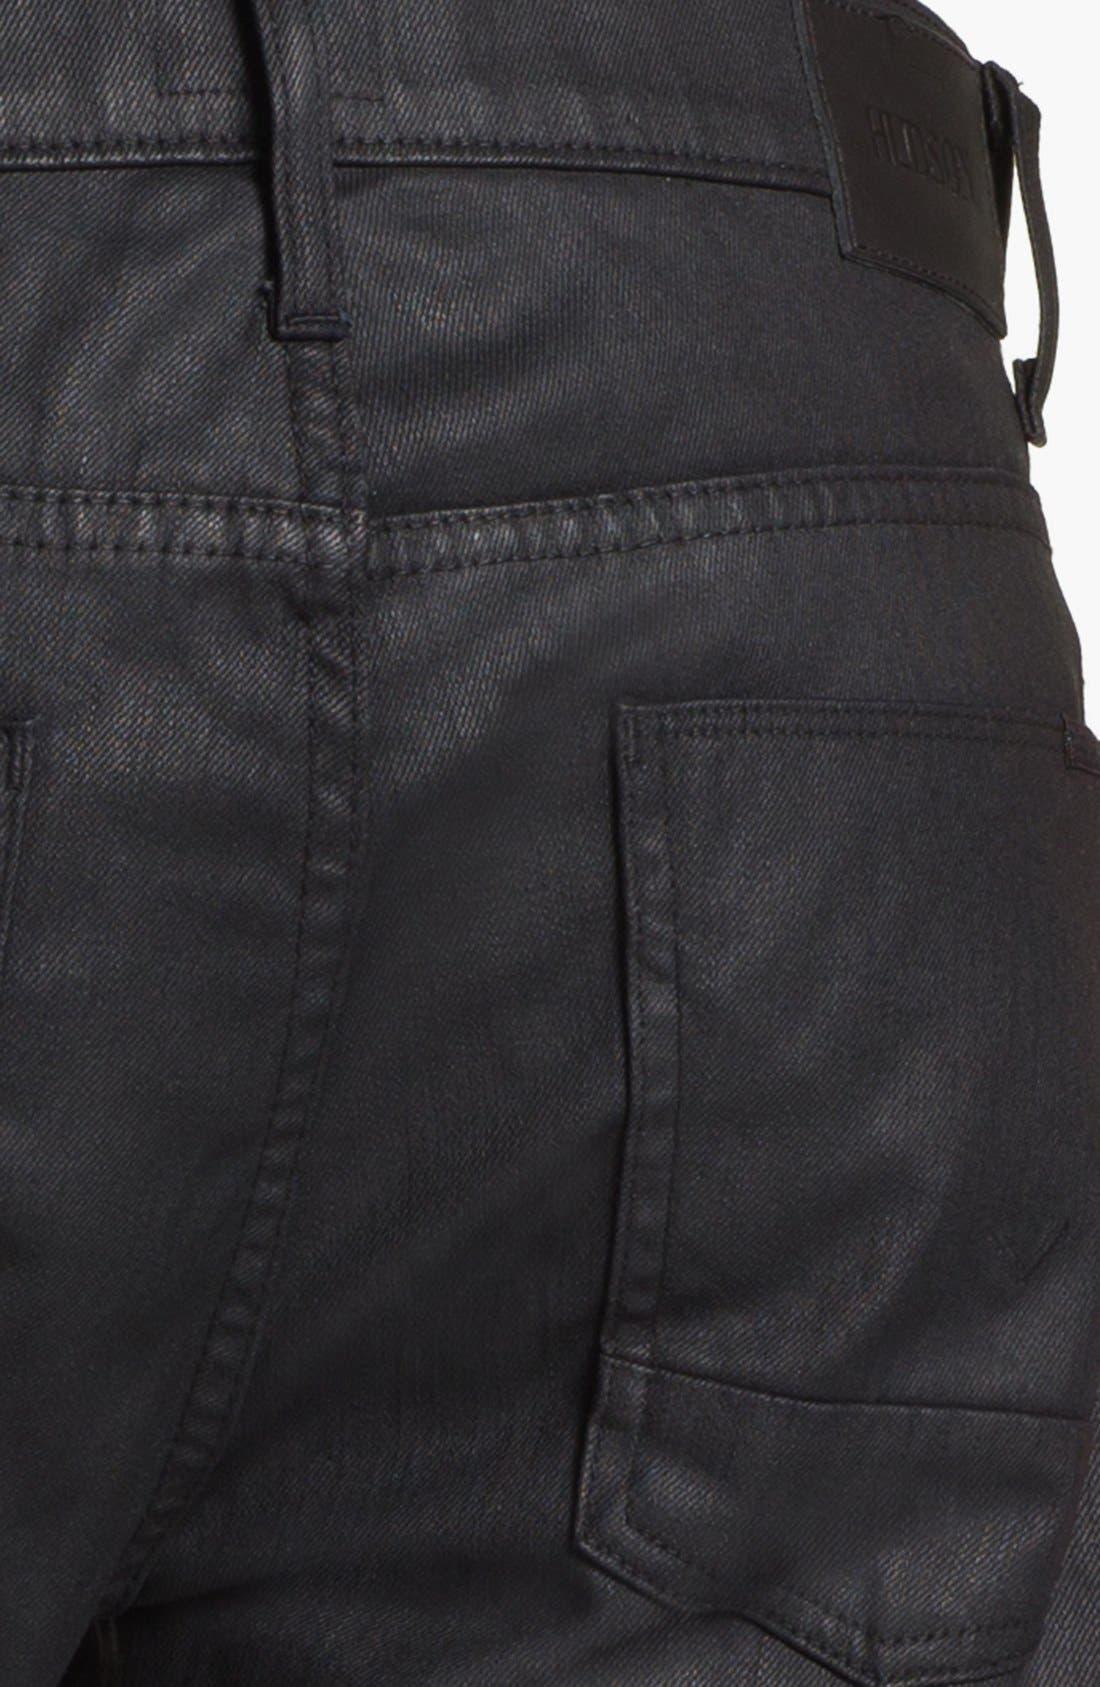 Alternate Image 4  - Hudson Jeans 'Dandy' Slouchy Straight Leg Jeans (Tar)